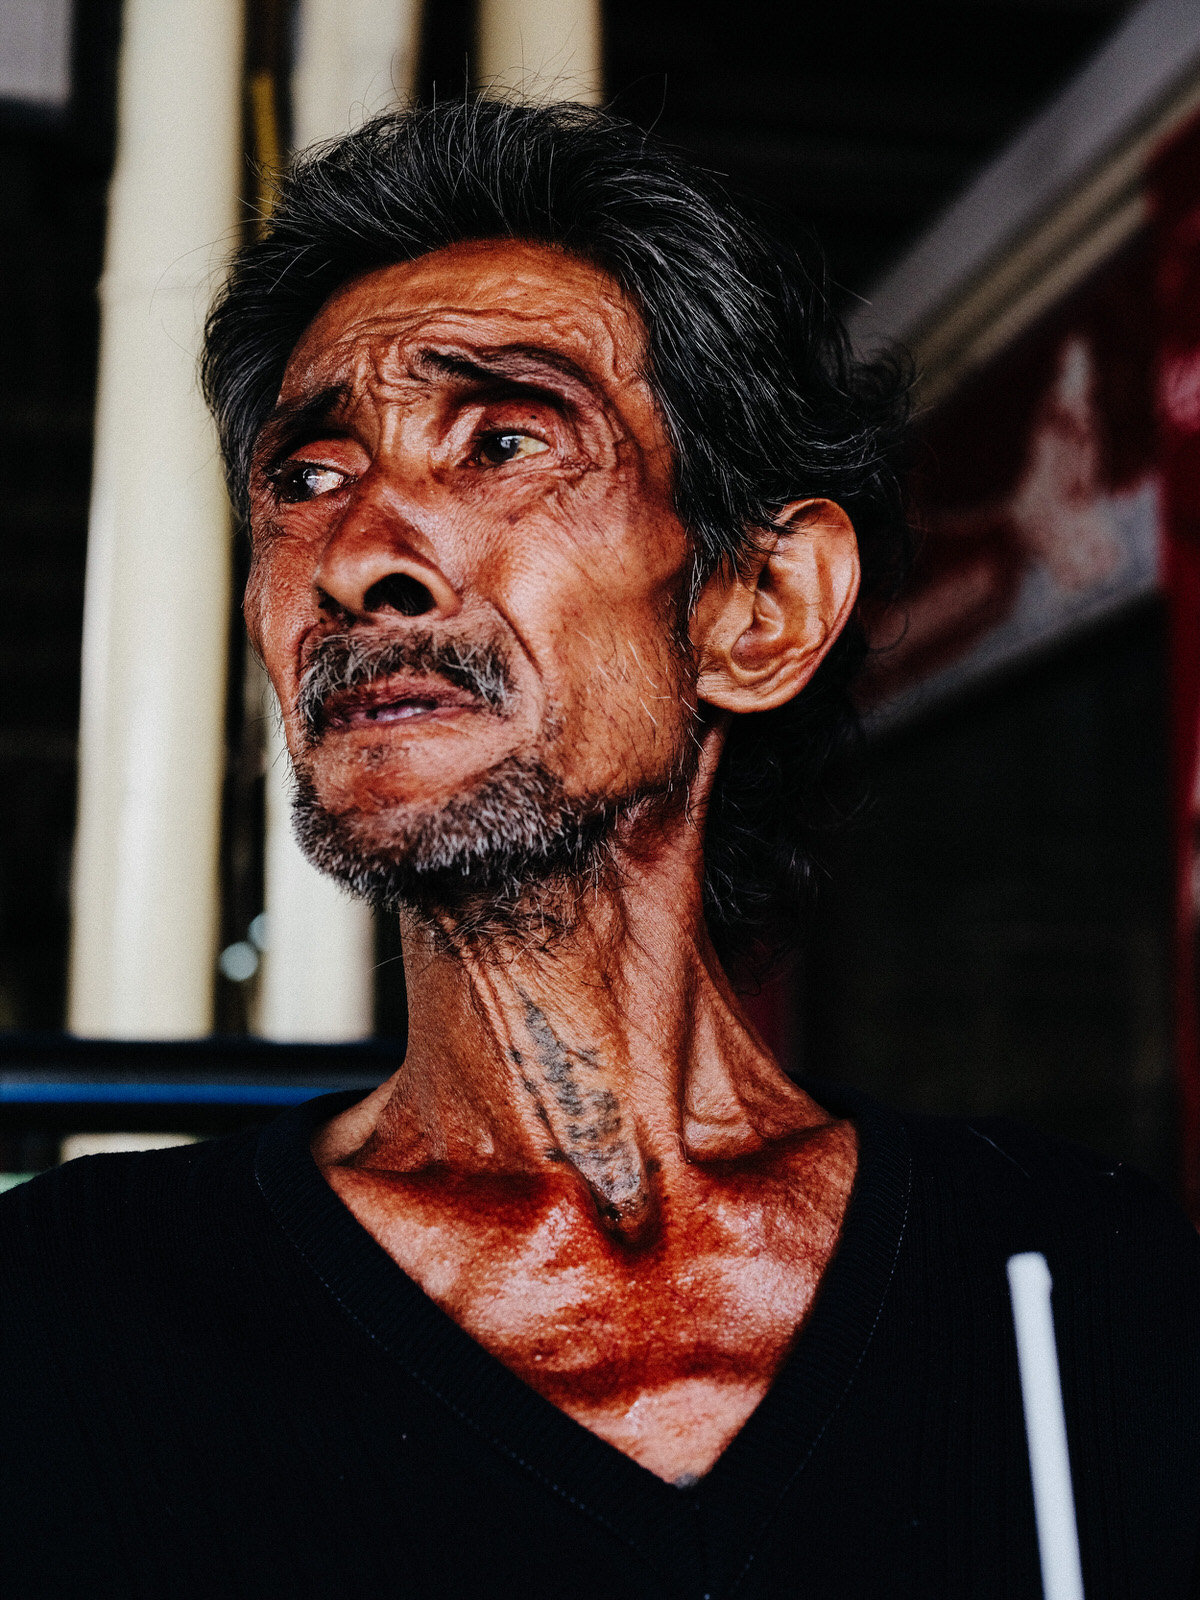 eric kim bangkok street photography fujifilm gfx color-7413